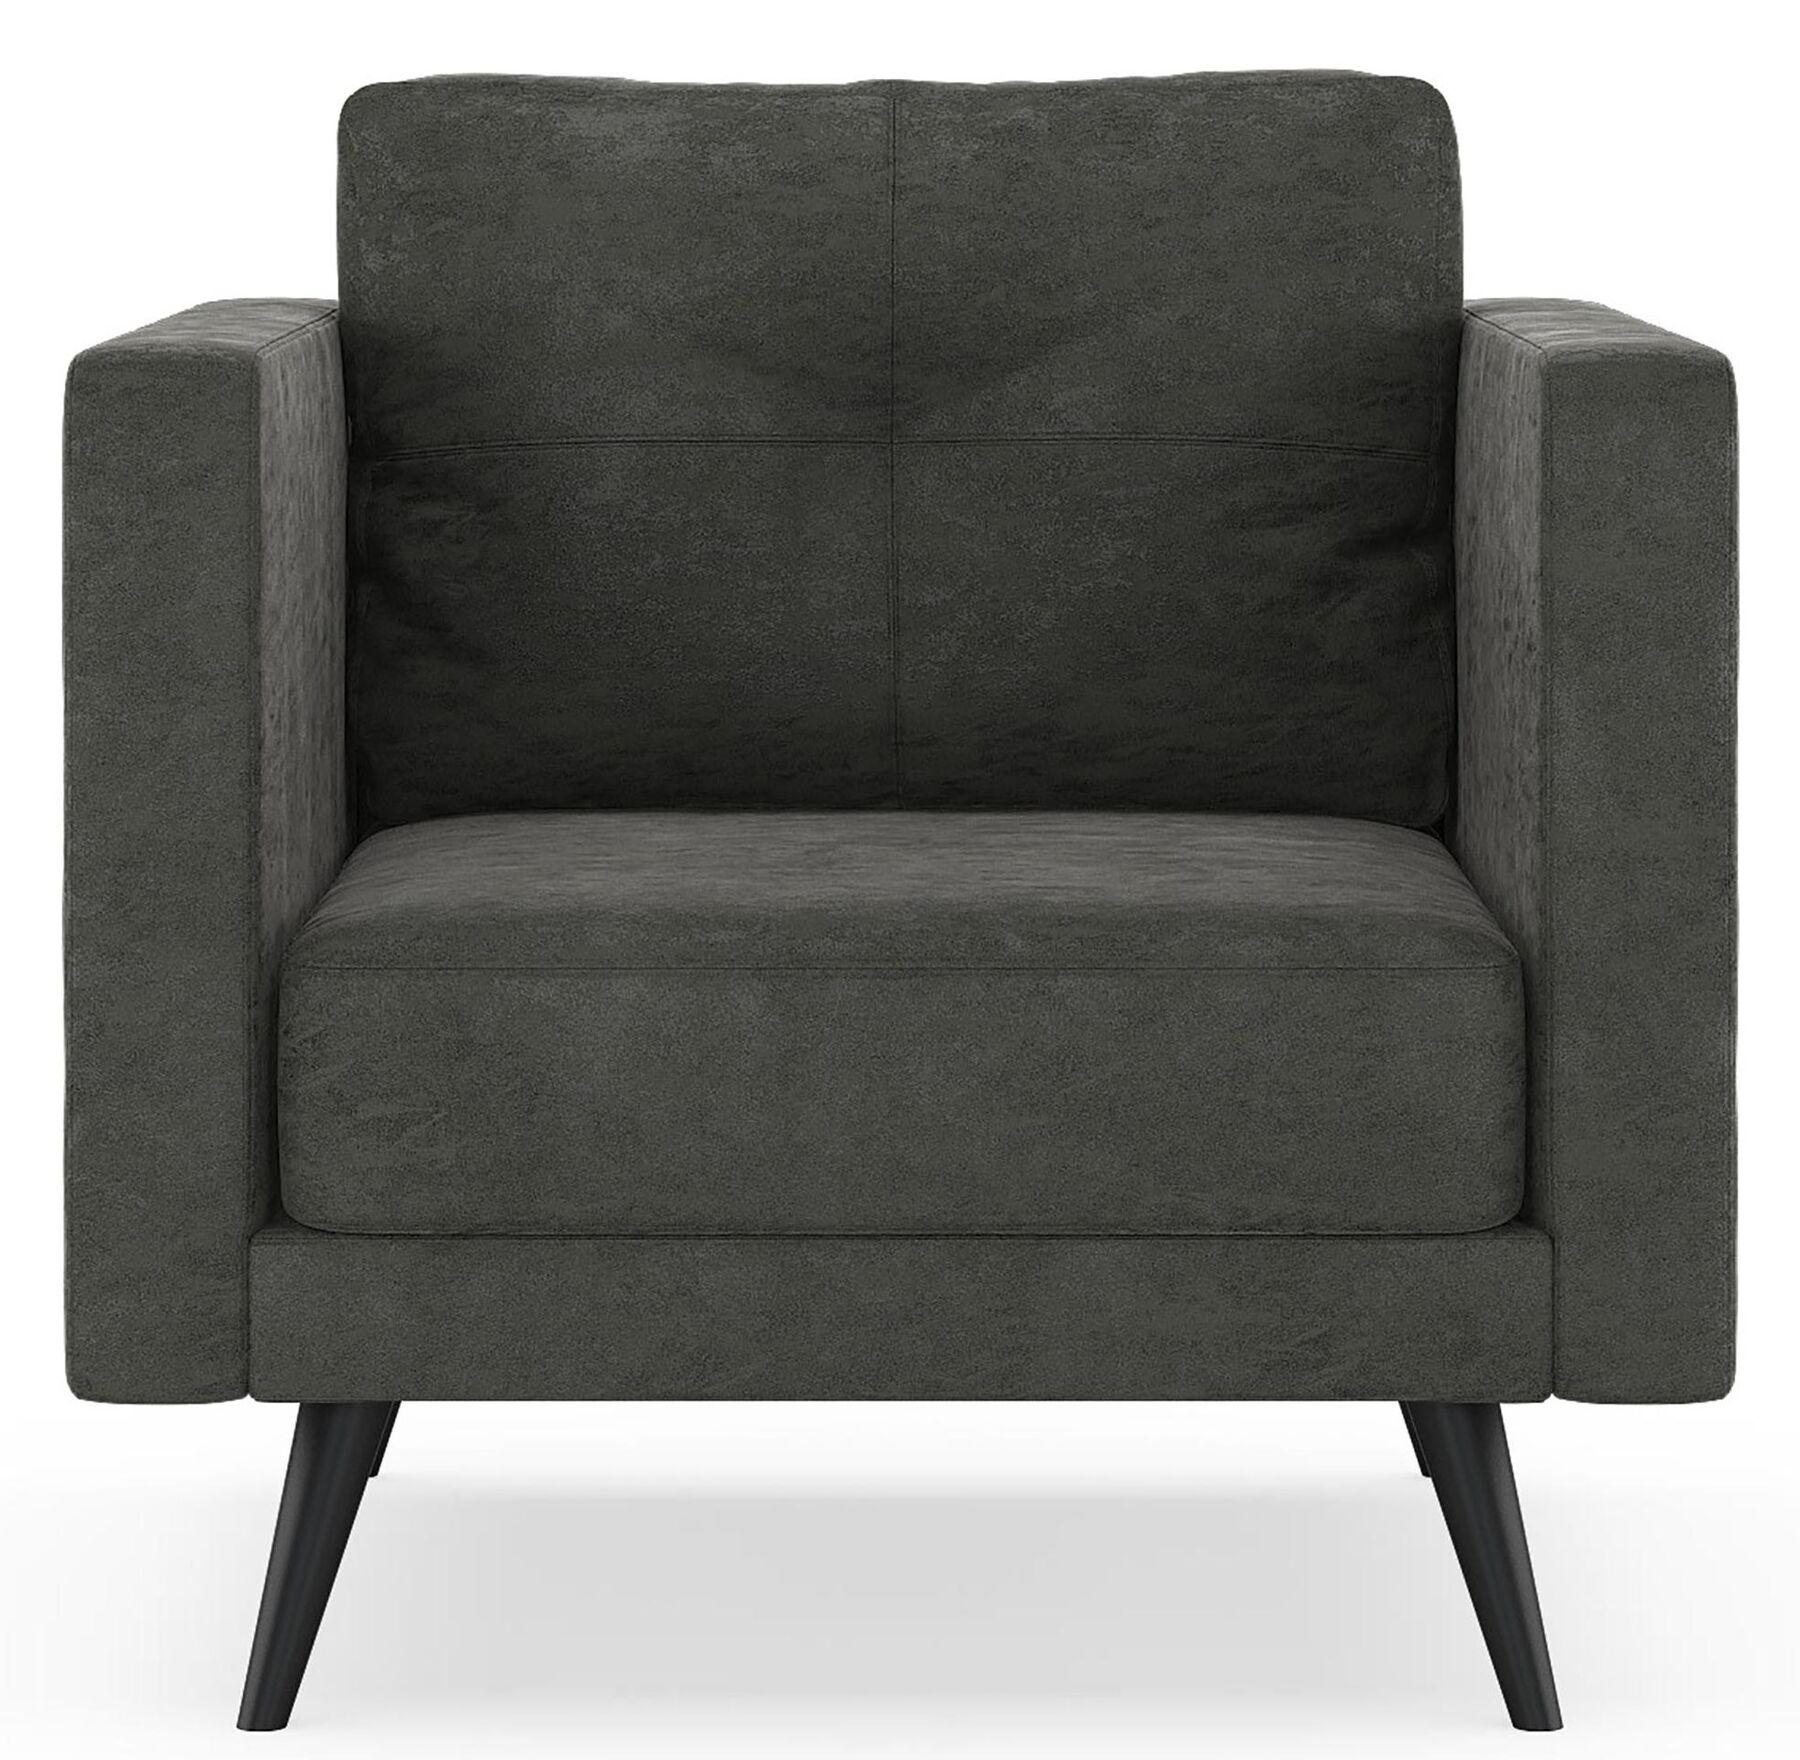 Crossland Armchair Upholstery: Mocha, Finish: Chrome